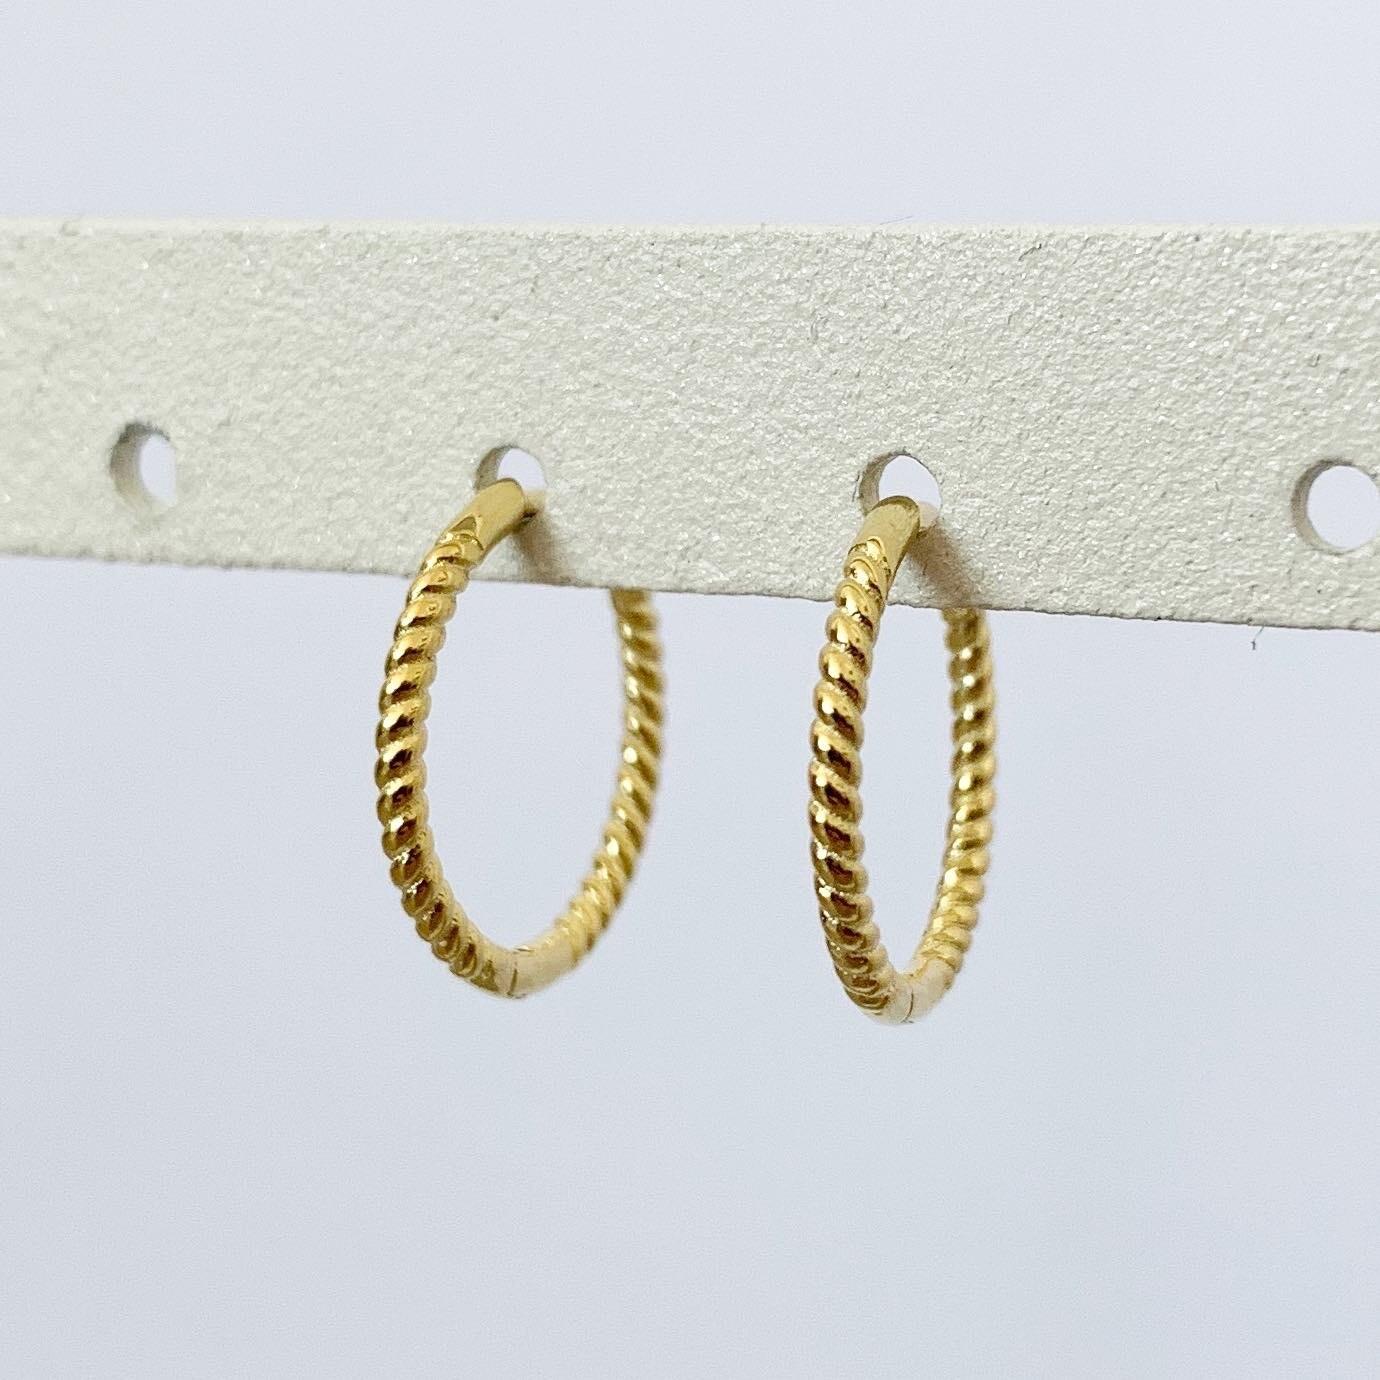 Twisted oorringetjes gold plated 13 MM